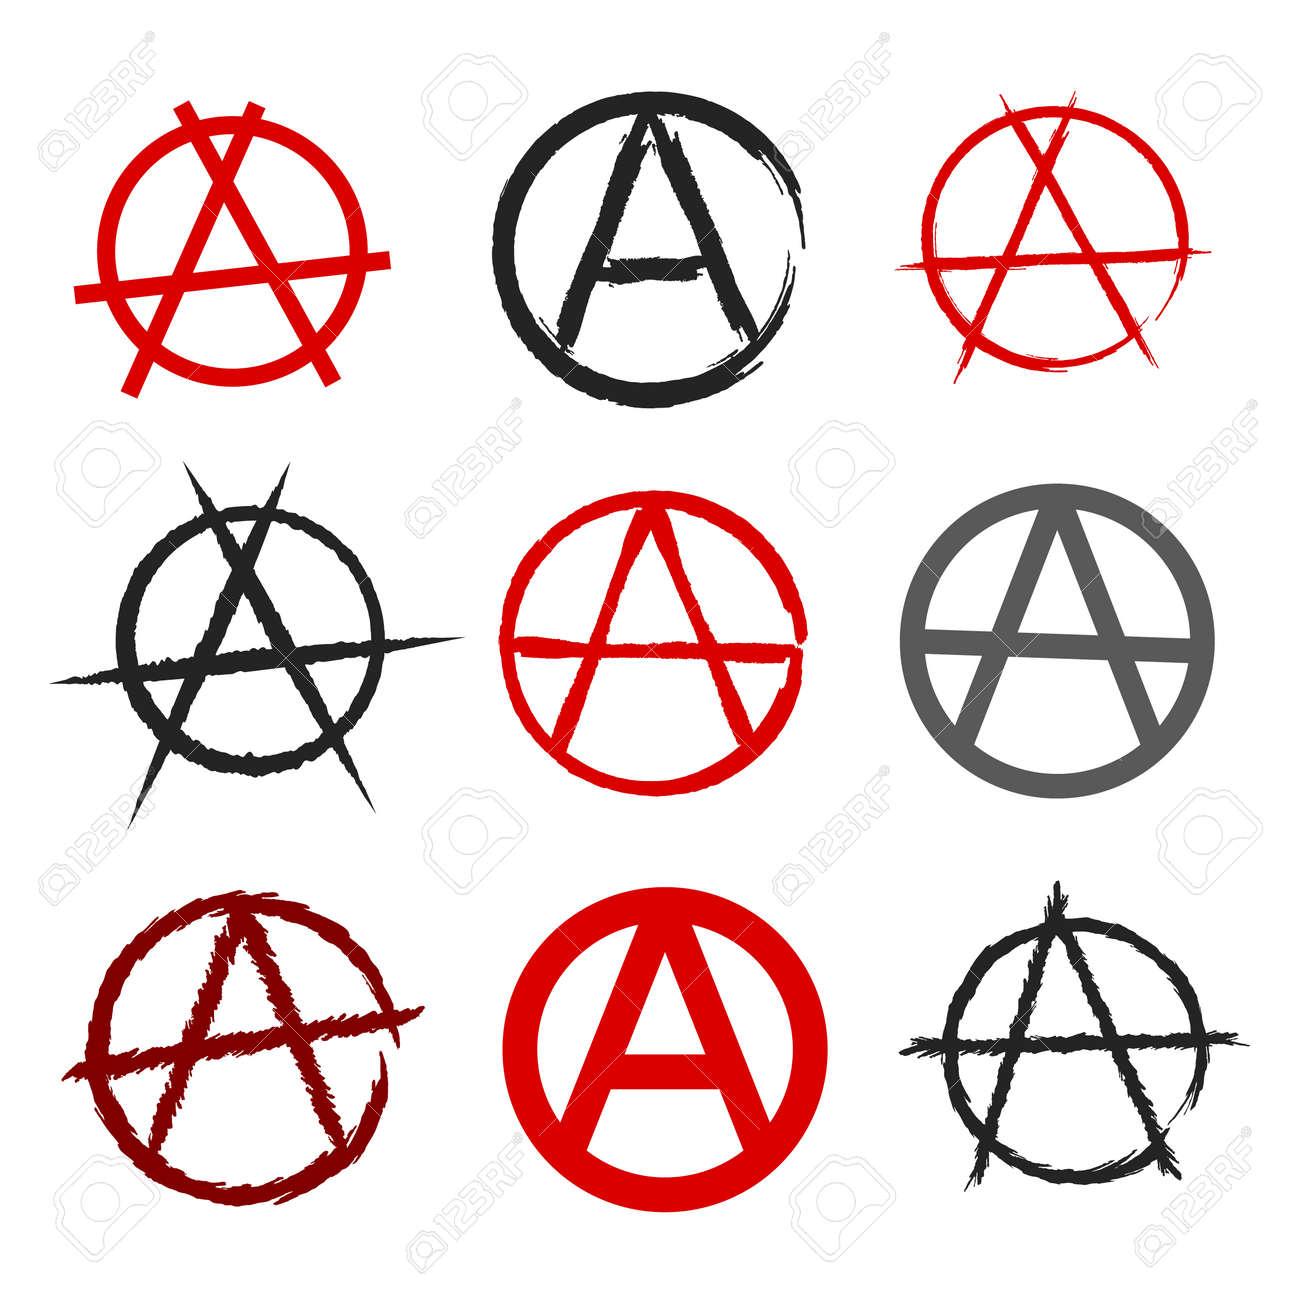 Anarchy symbol set royalty free cliparts vectors and stock anarchy symbol set stock vector 31672081 buycottarizona